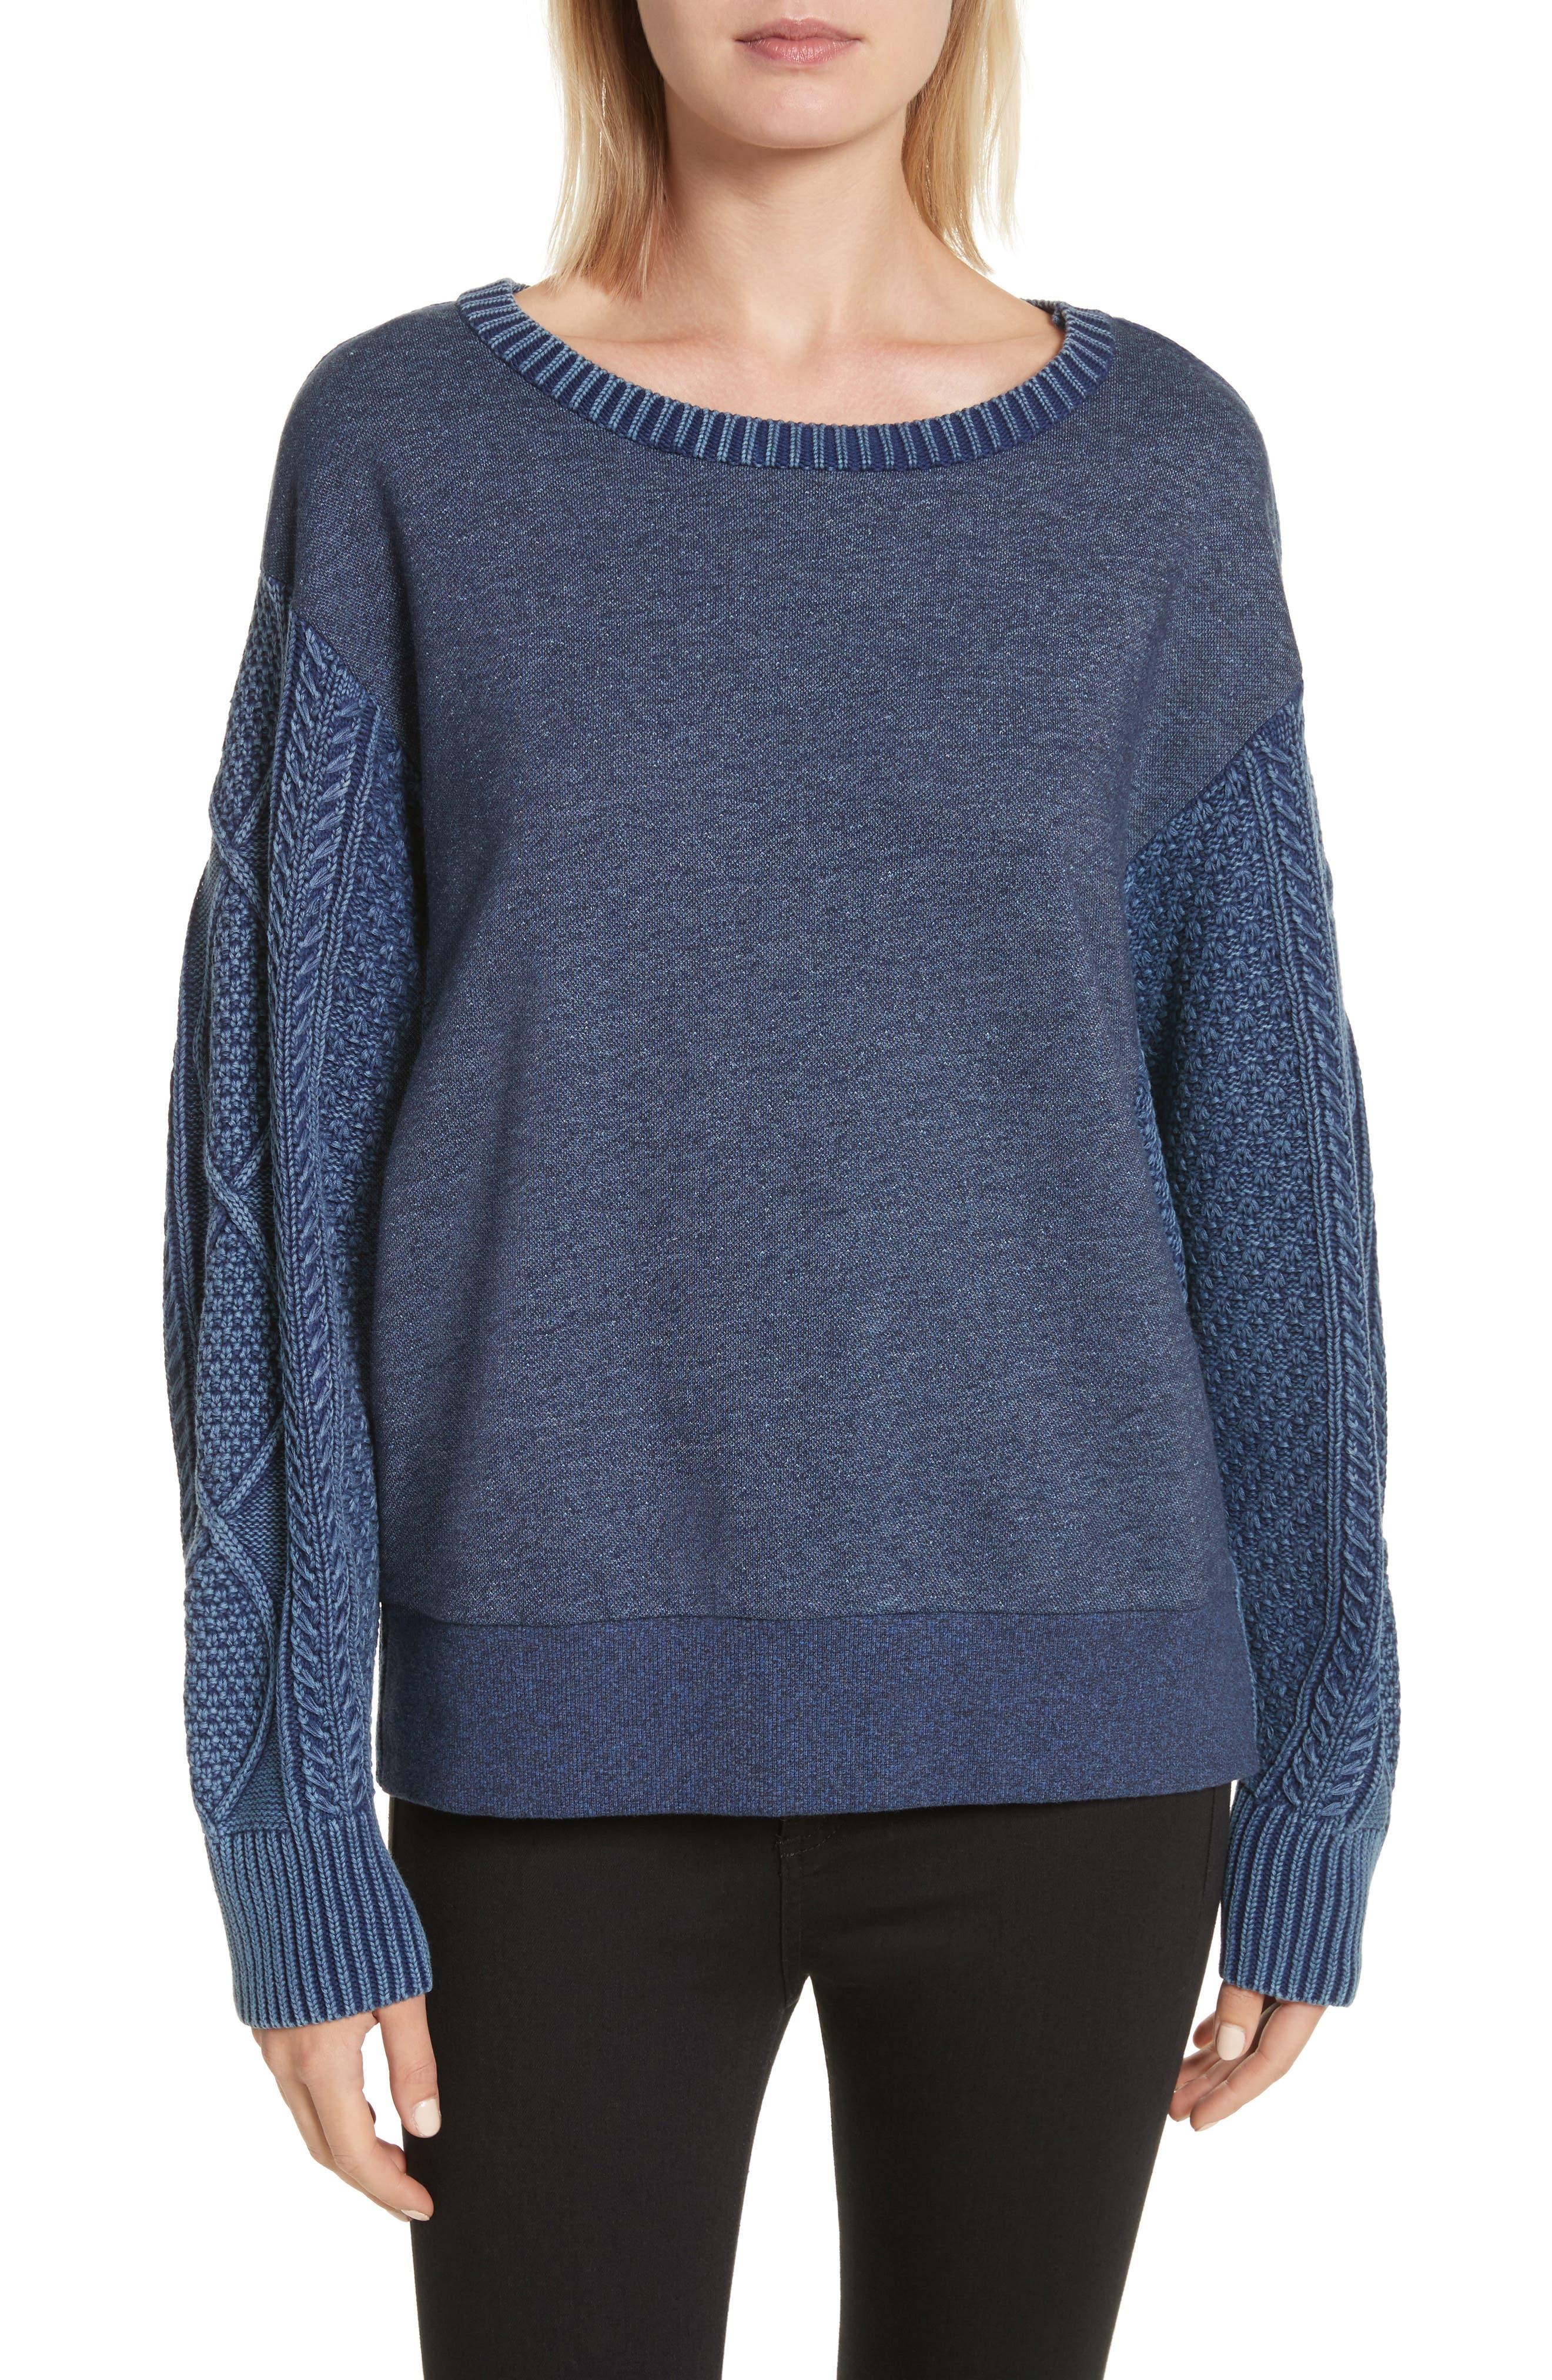 Main Image - rag & bone Harper Cable Knit Sweater